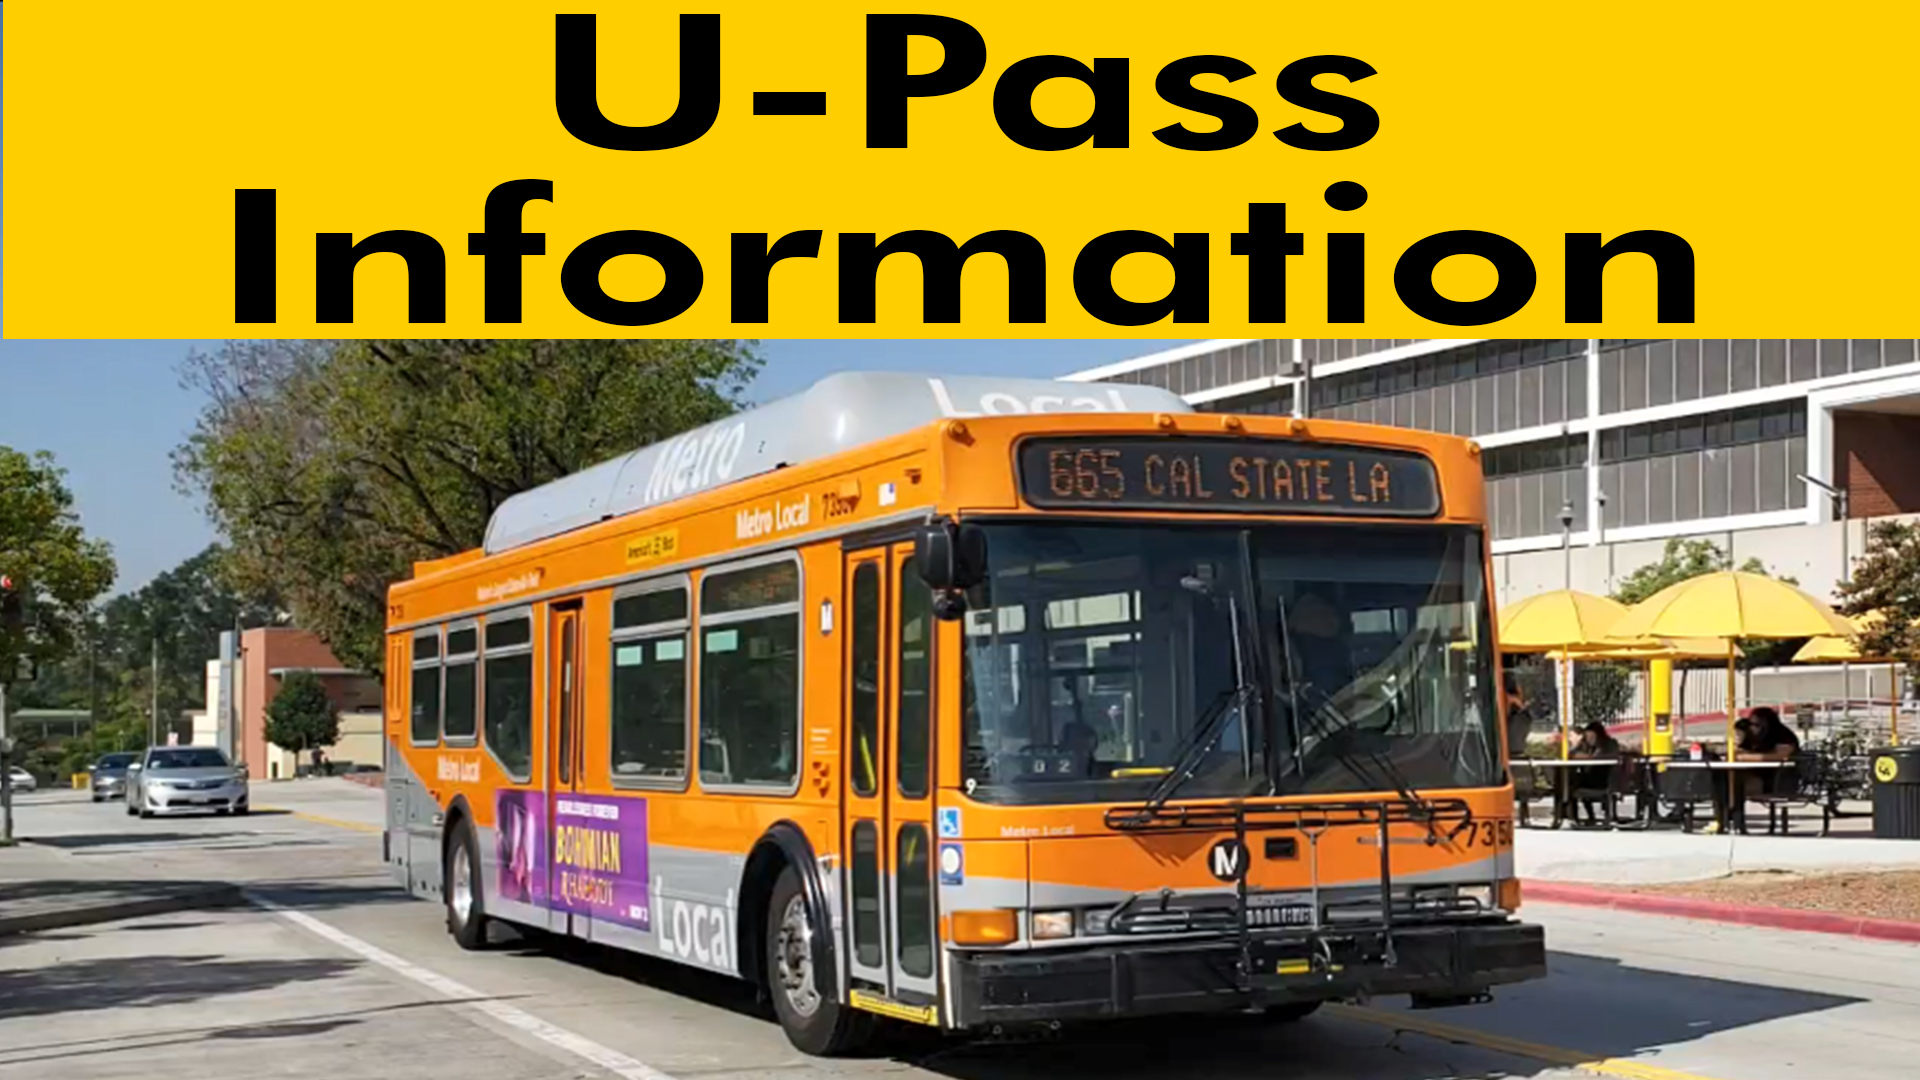 U-Pass Information